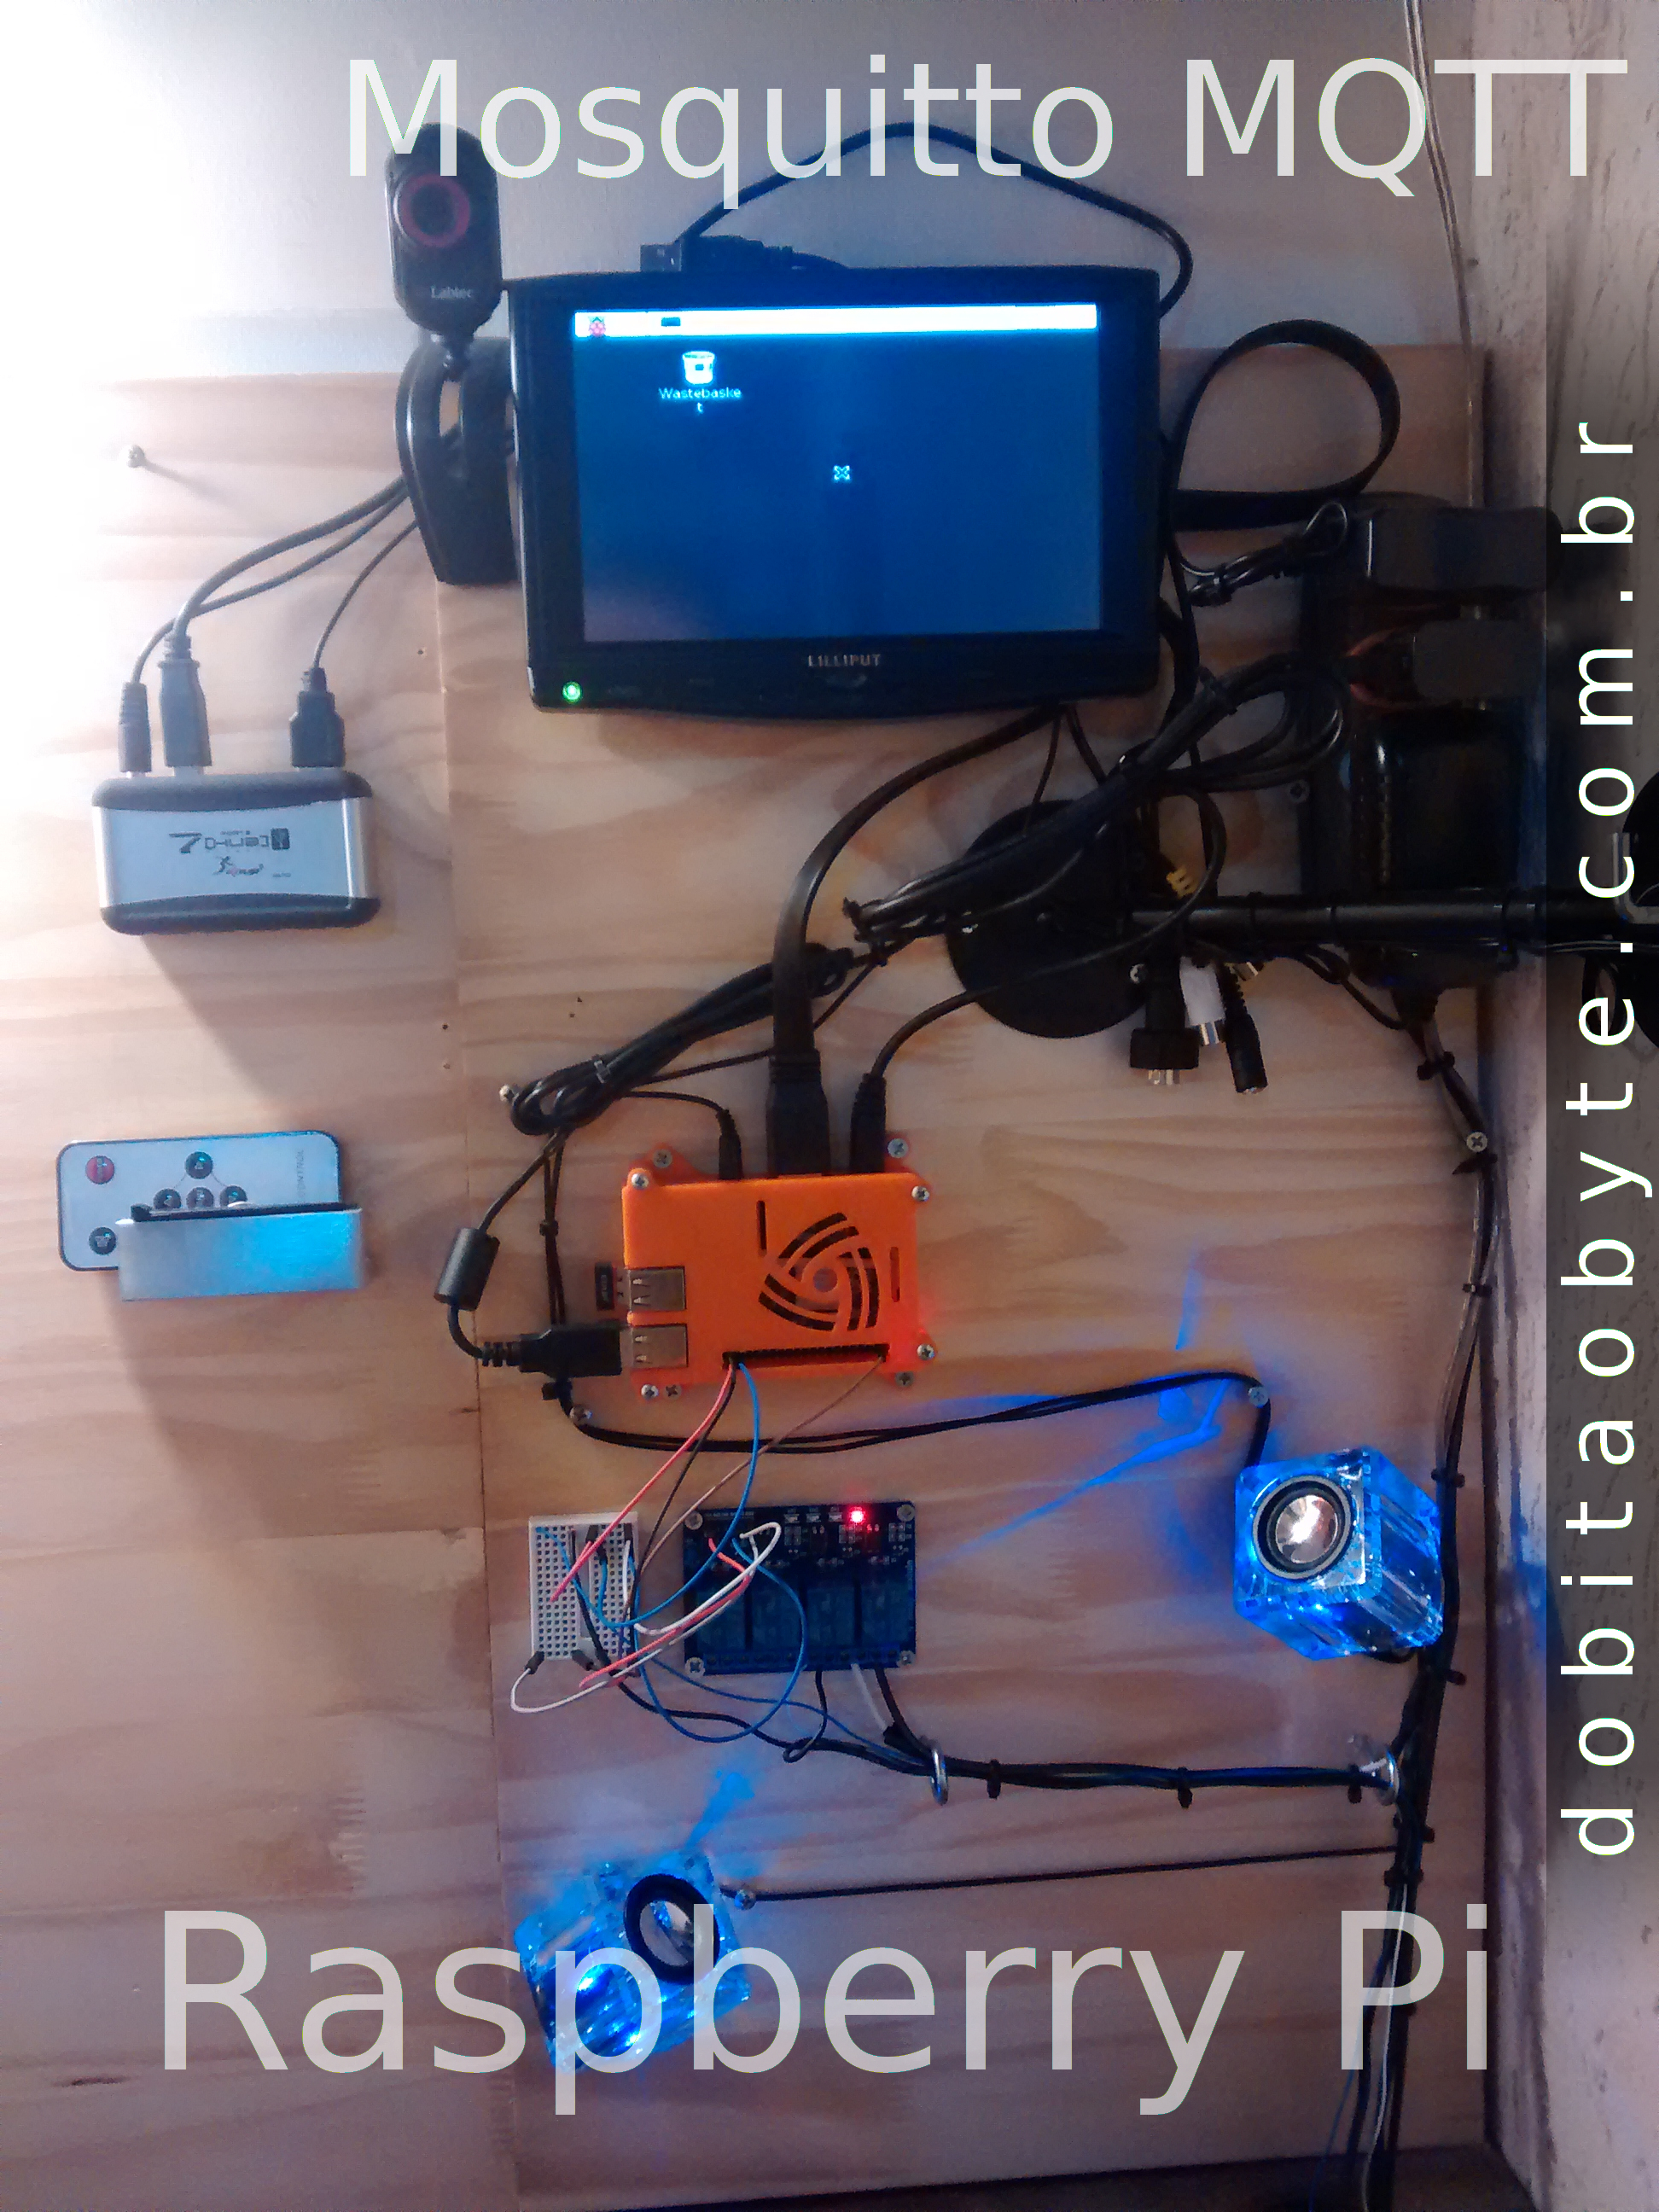 Domótica - MQTT e Raspberry - servidor NTP no Raspberry